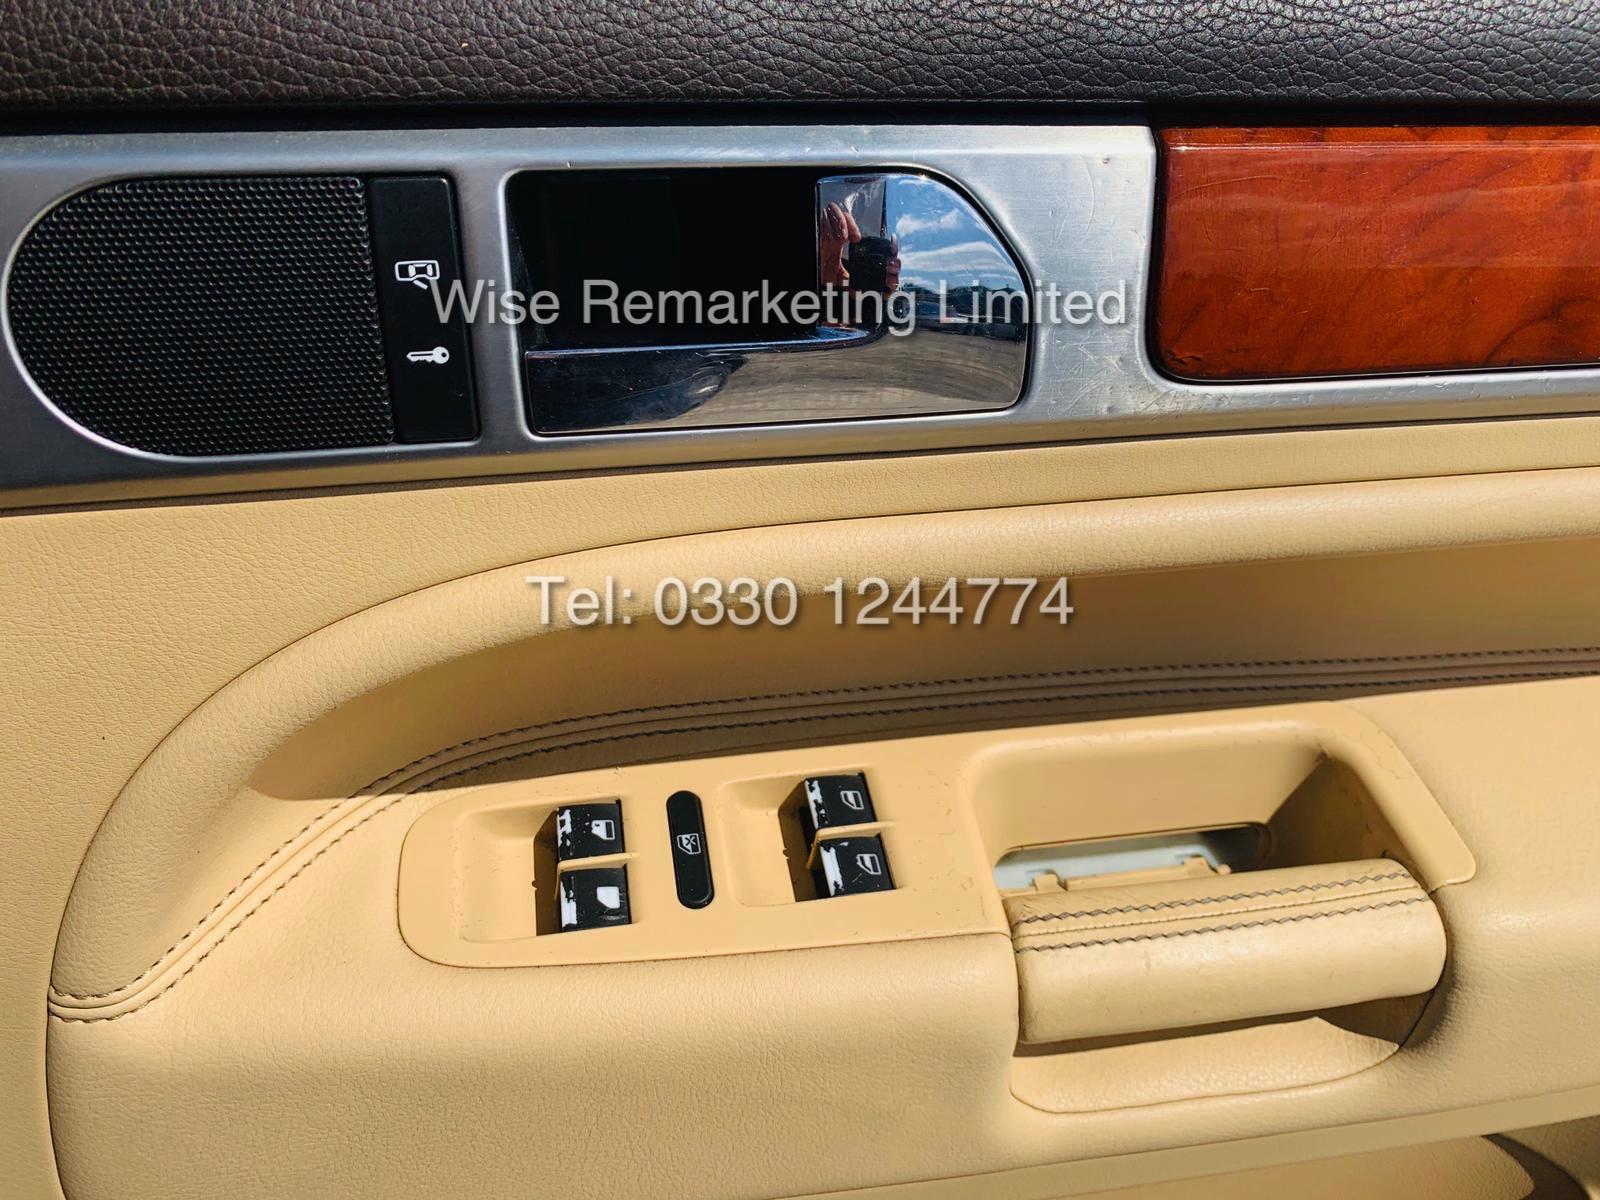 VOLKSWAGEN TOUAREG 2.5 TDI SPORT AUTO 2004 REG 4x4 BLACK - CREAM LEATHER - Image 10 of 24